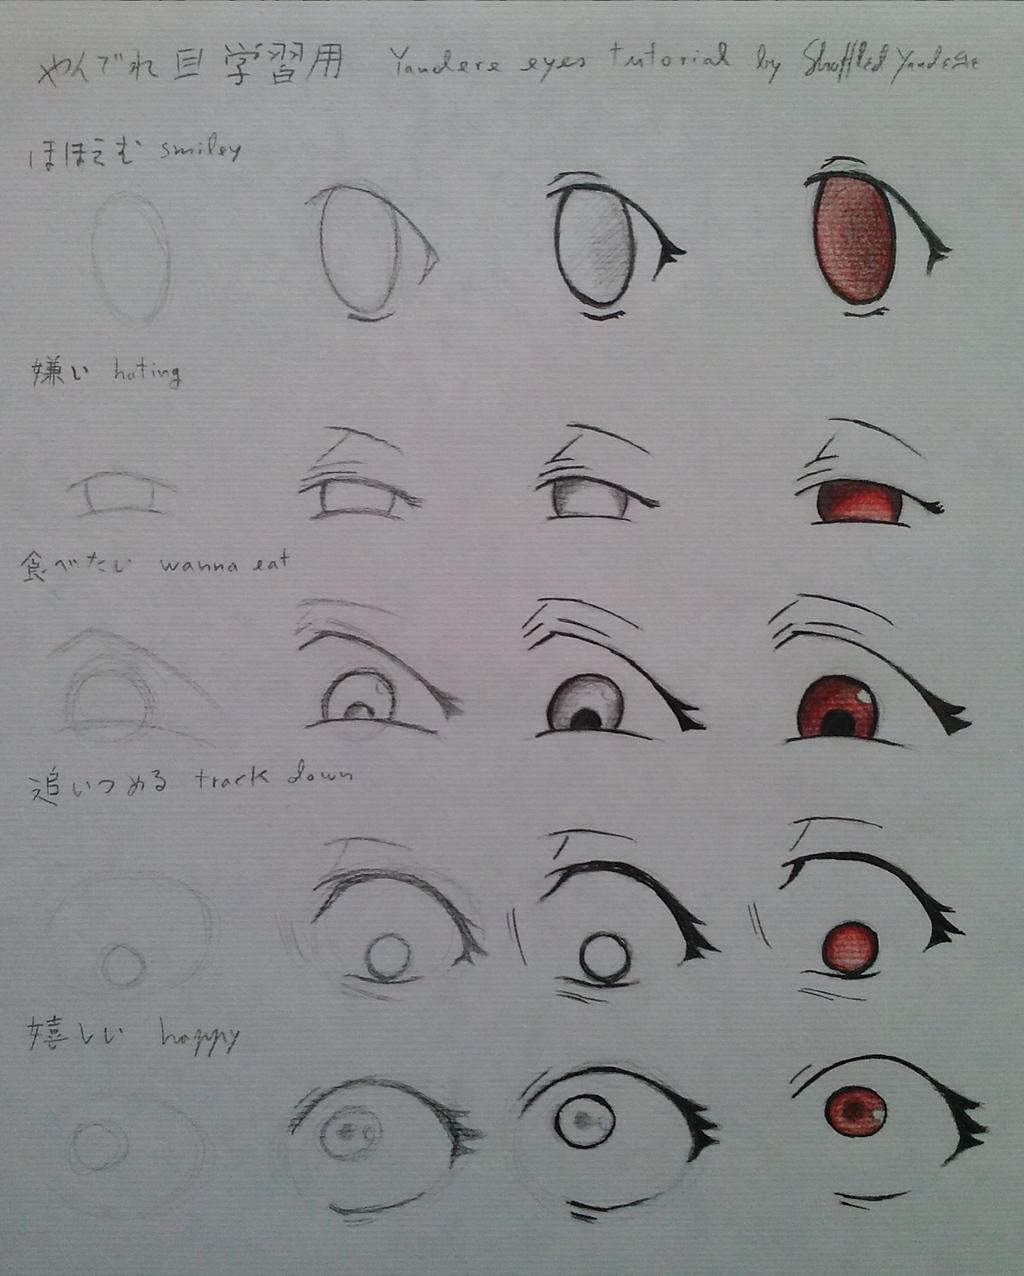 Yandere Eyes Tutorial by ShuffledYandere on DeviantArt